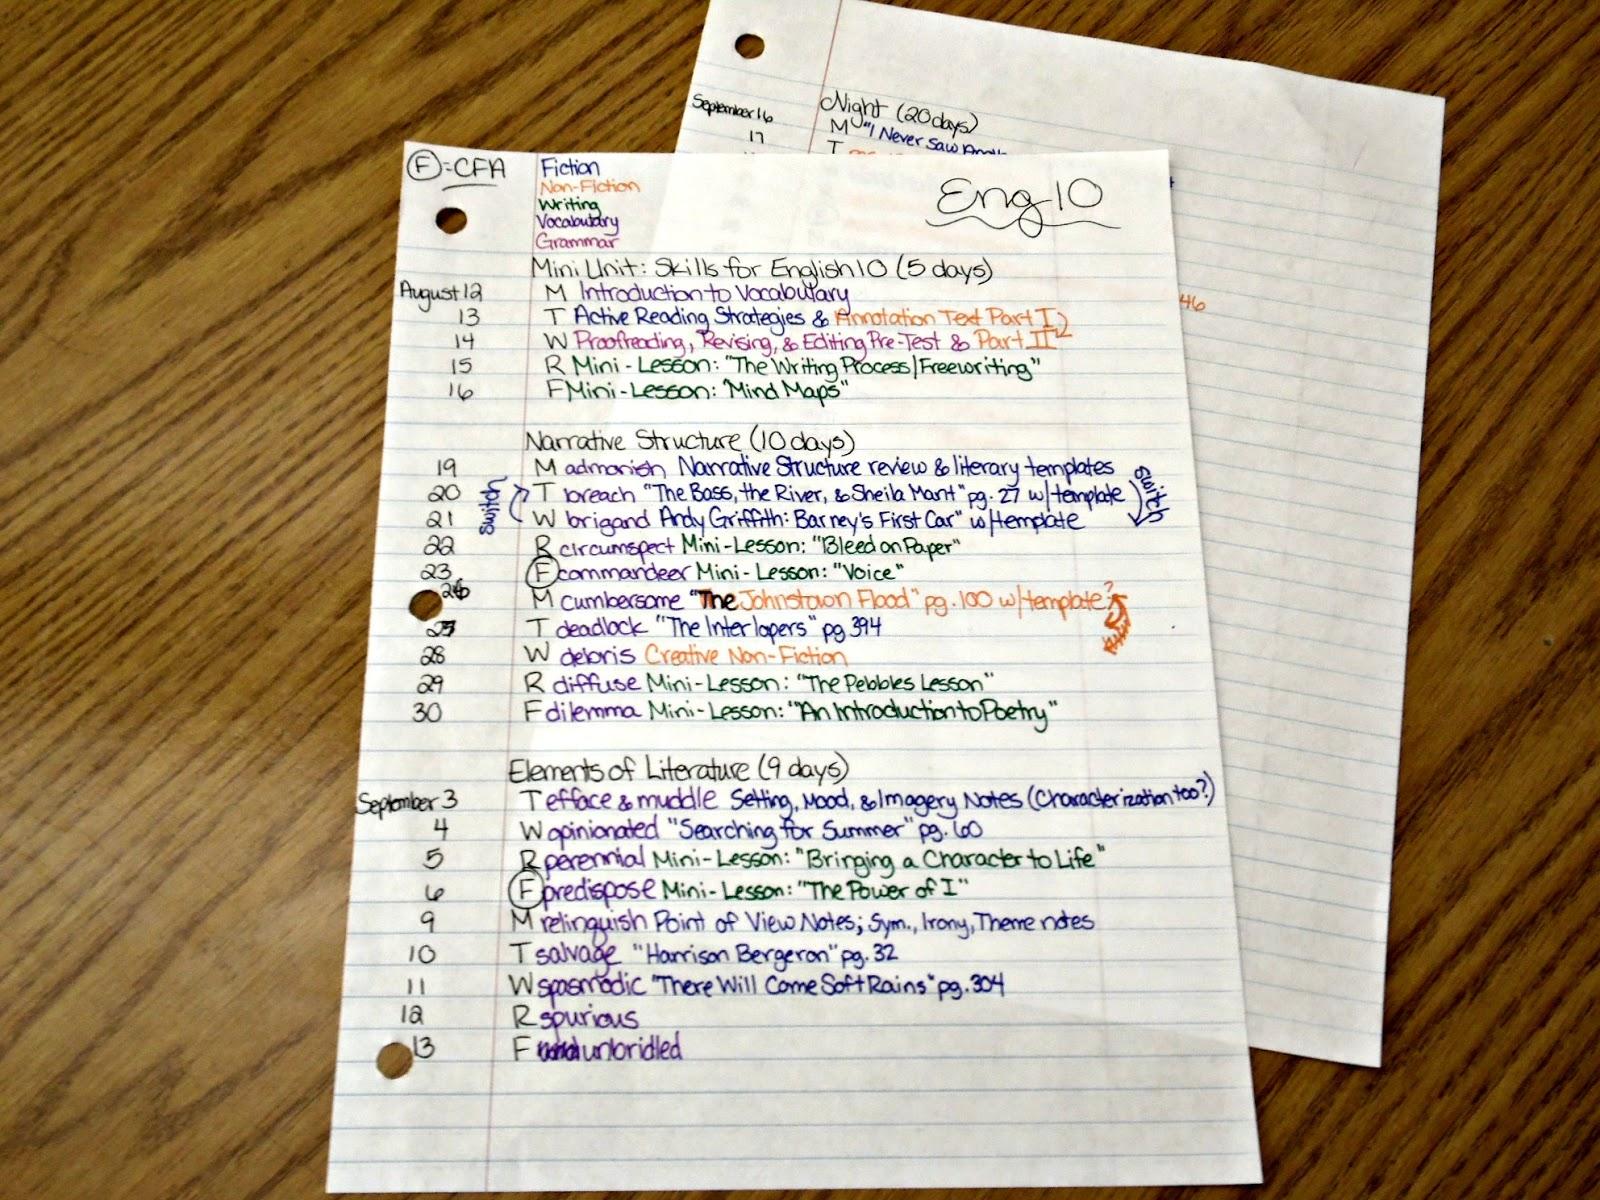 pacing calendar template for teachers - Suzen rabionetassociats com